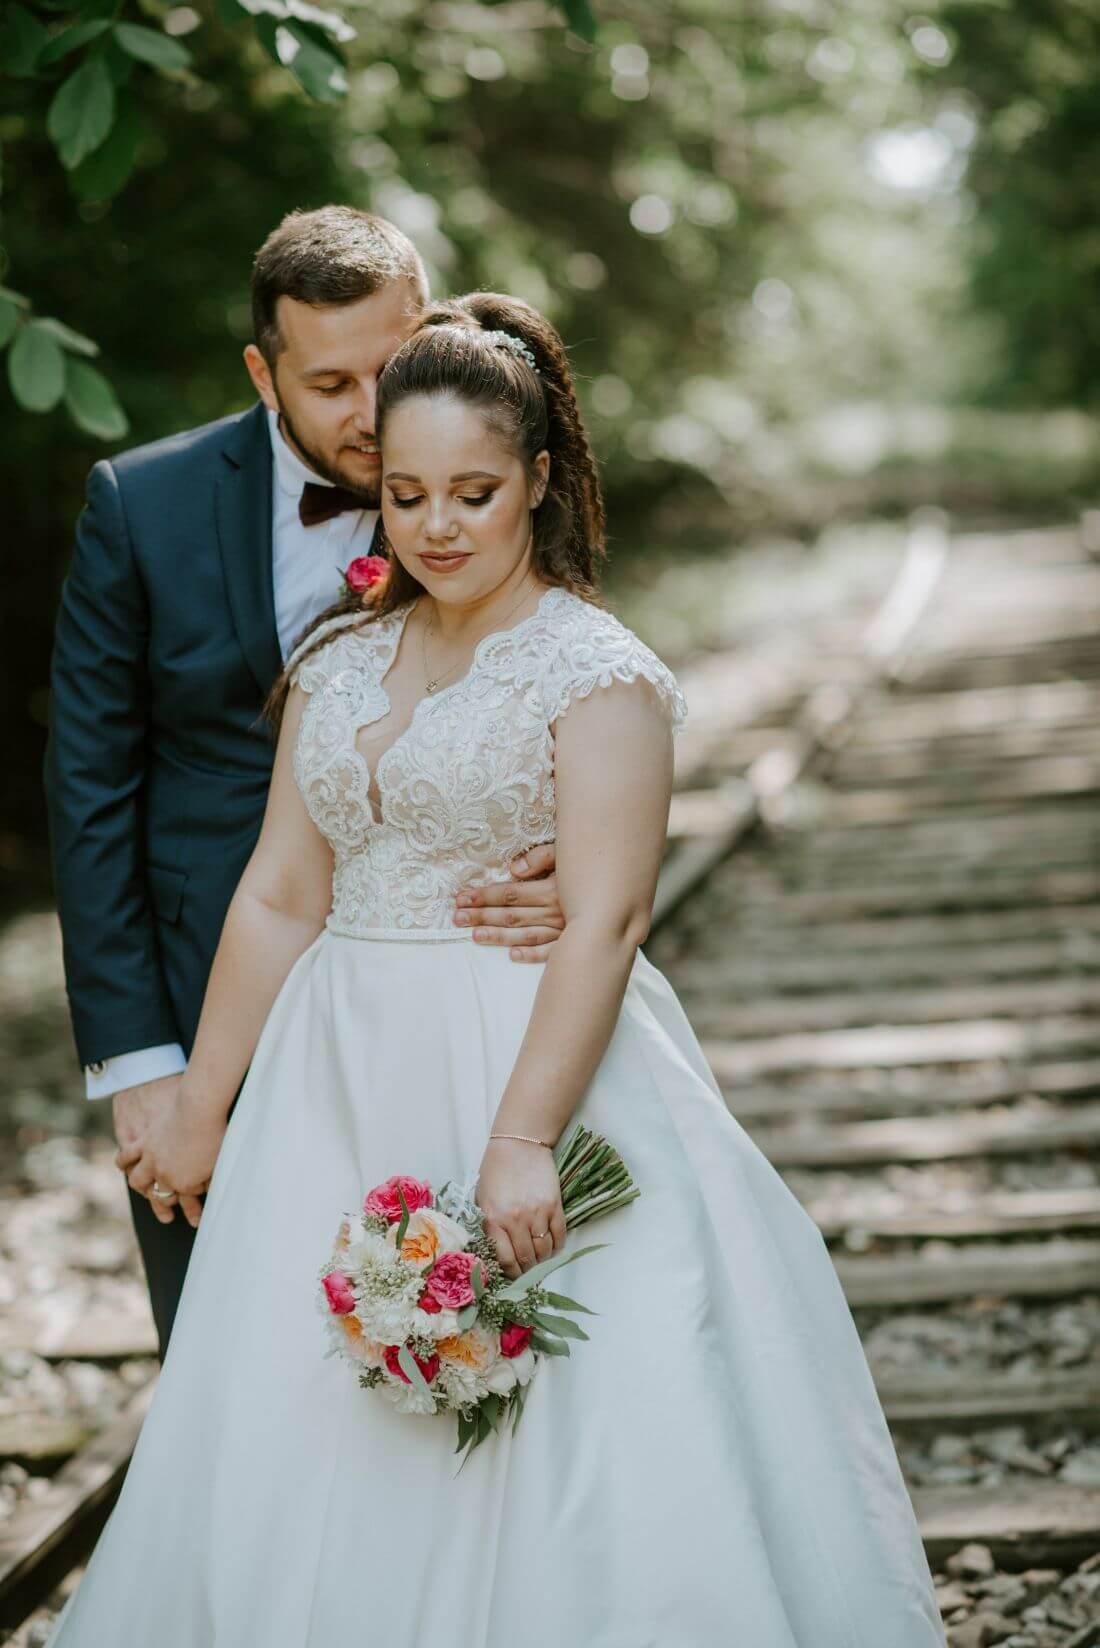 Nunta cu multe calatorii si farfurii – Alexandra si Catalin – IDO-Weddings-nuntiinaerliber (6)